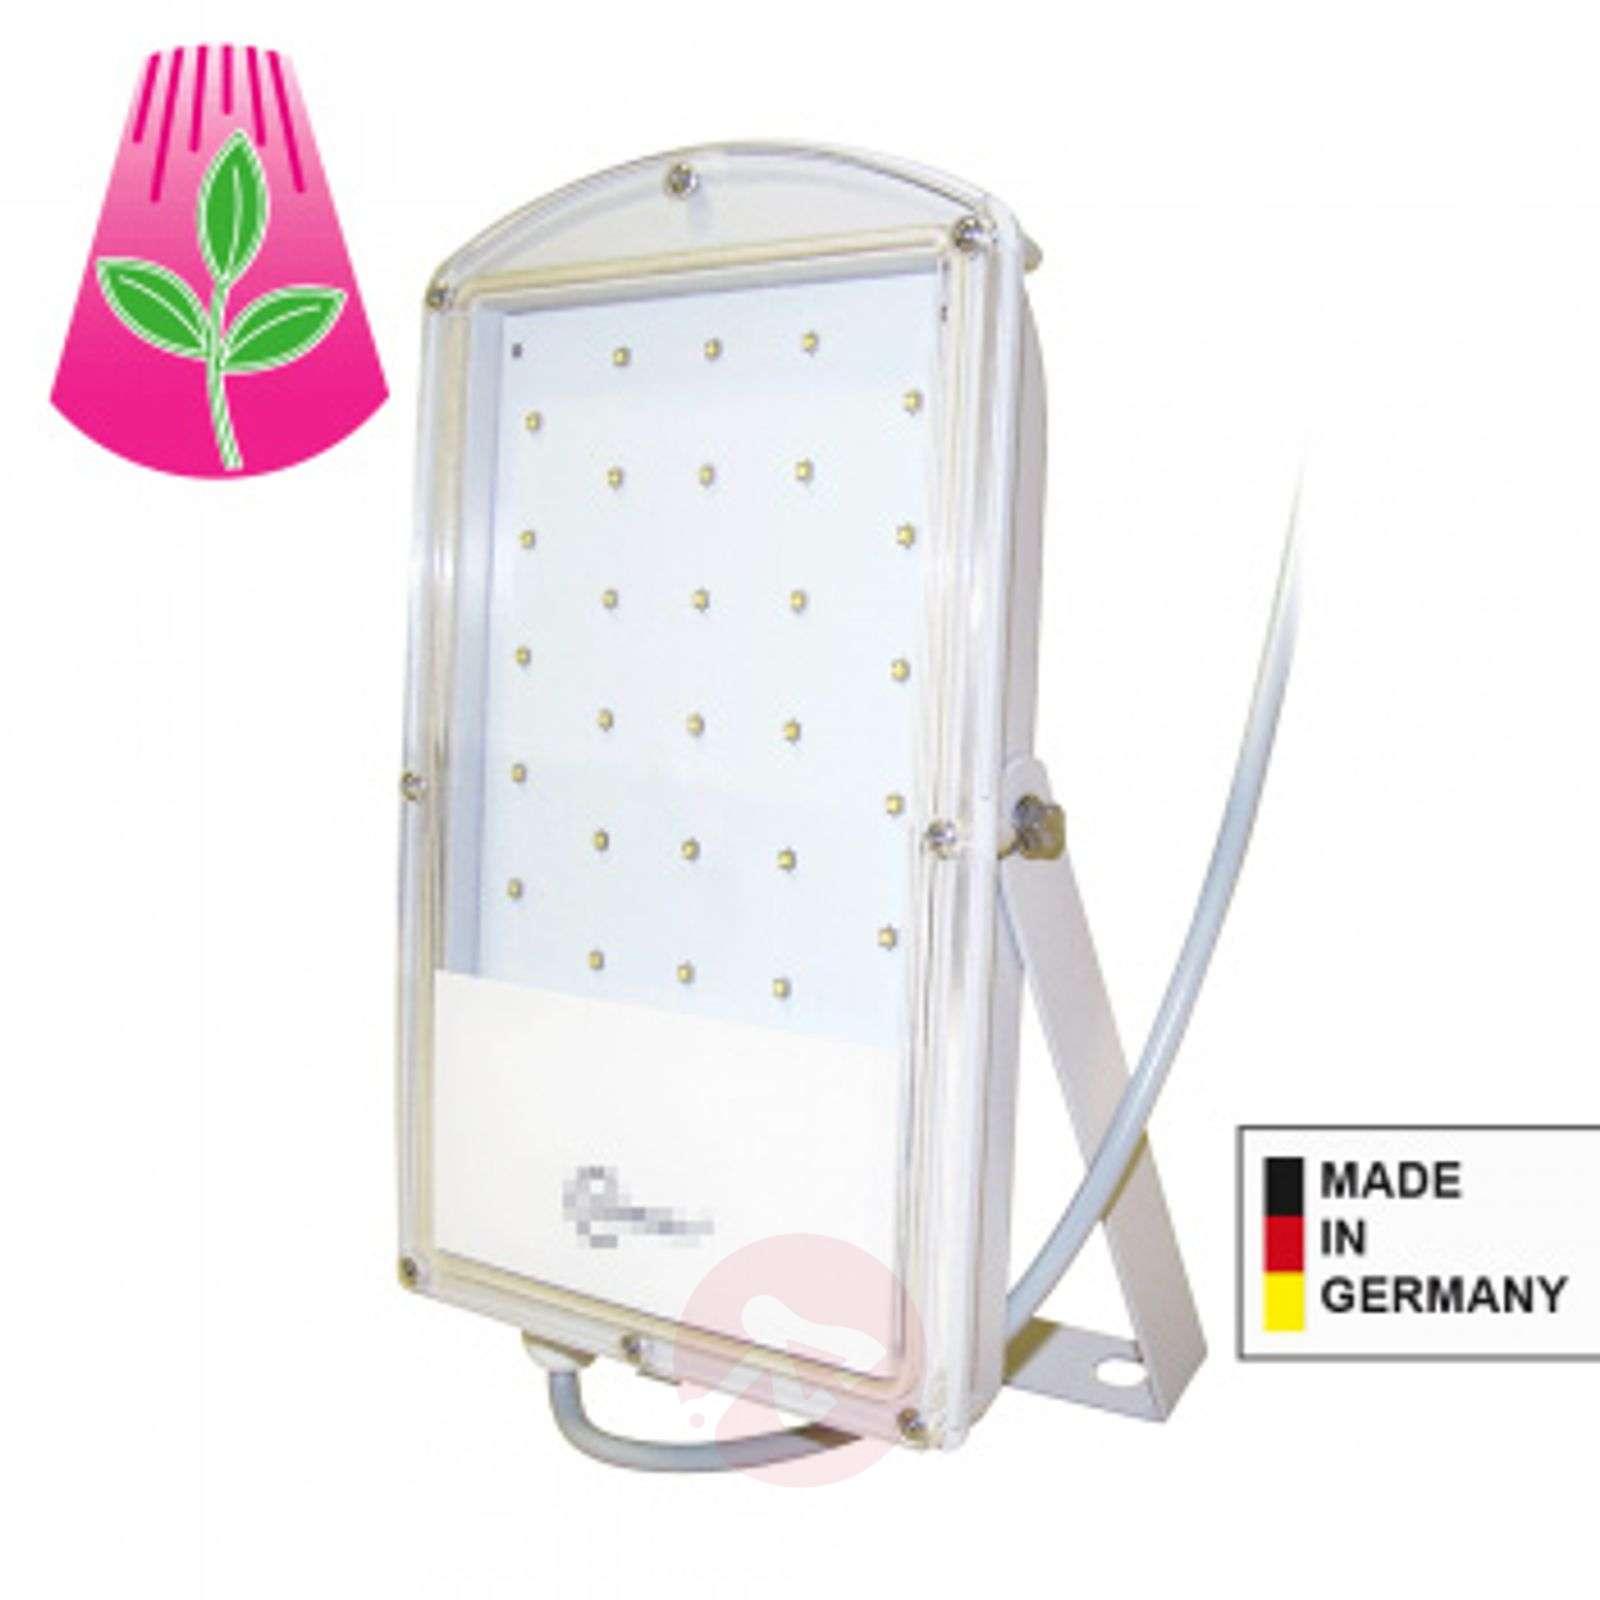 LED-kasvilamppu Astir-2515063-01